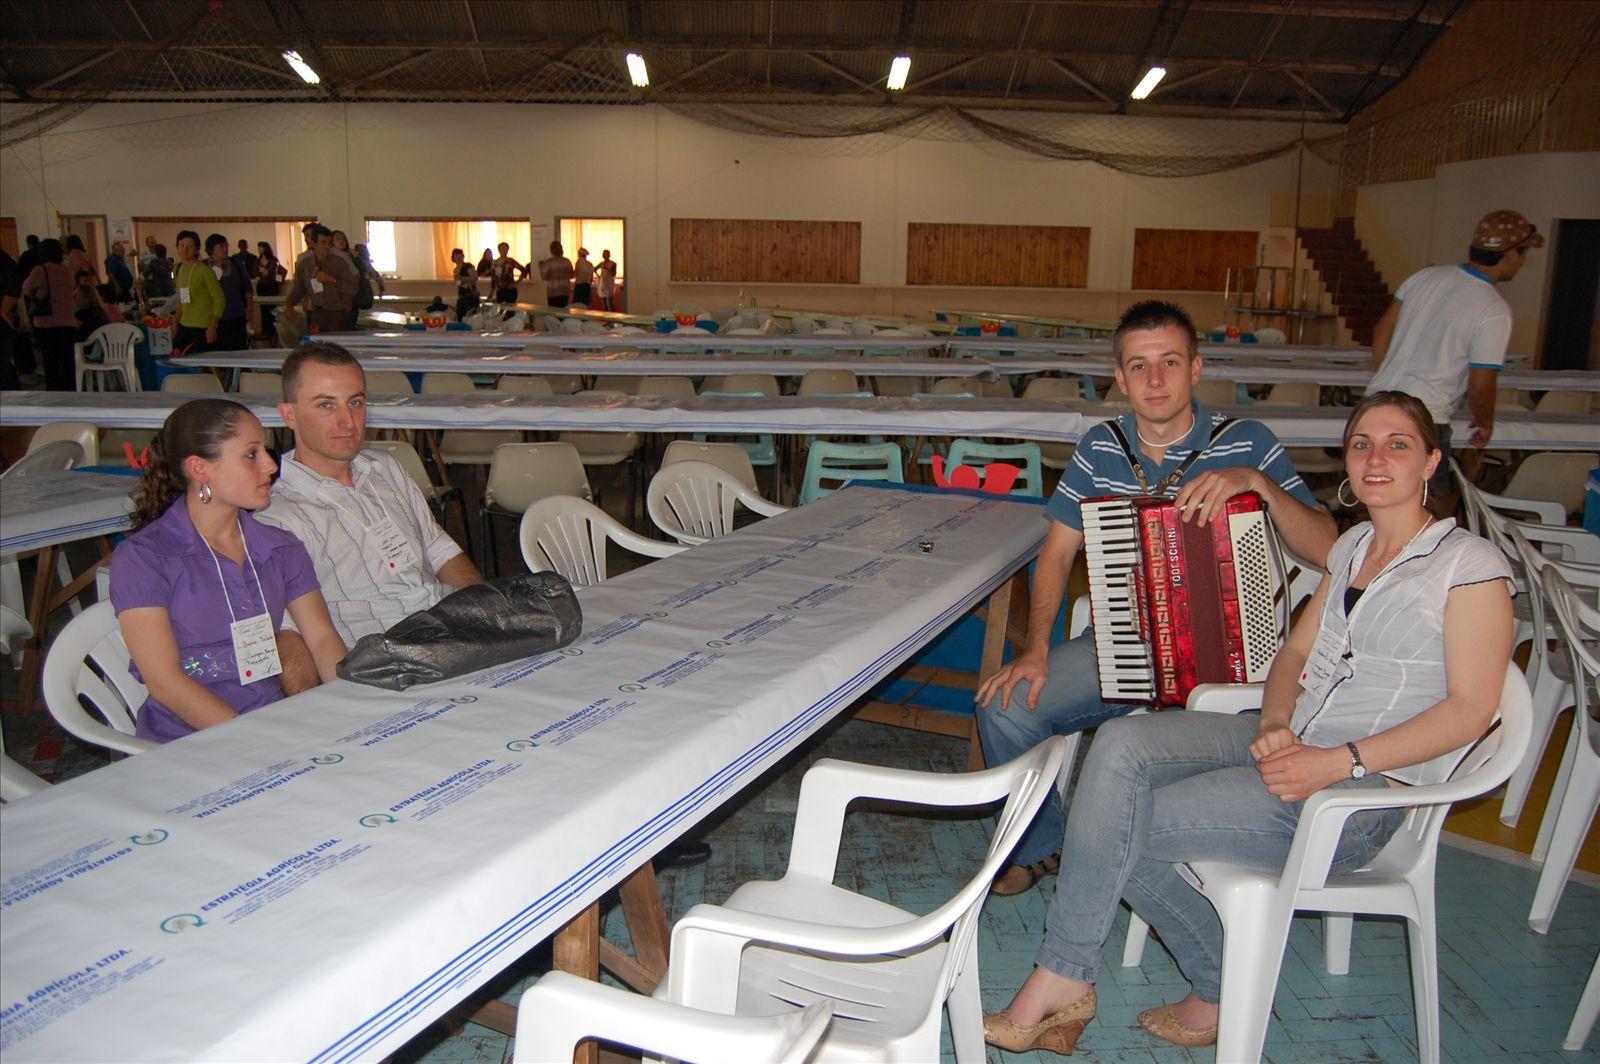 2º Encontro Família Cornelli - 11.10.2009 (85)_0